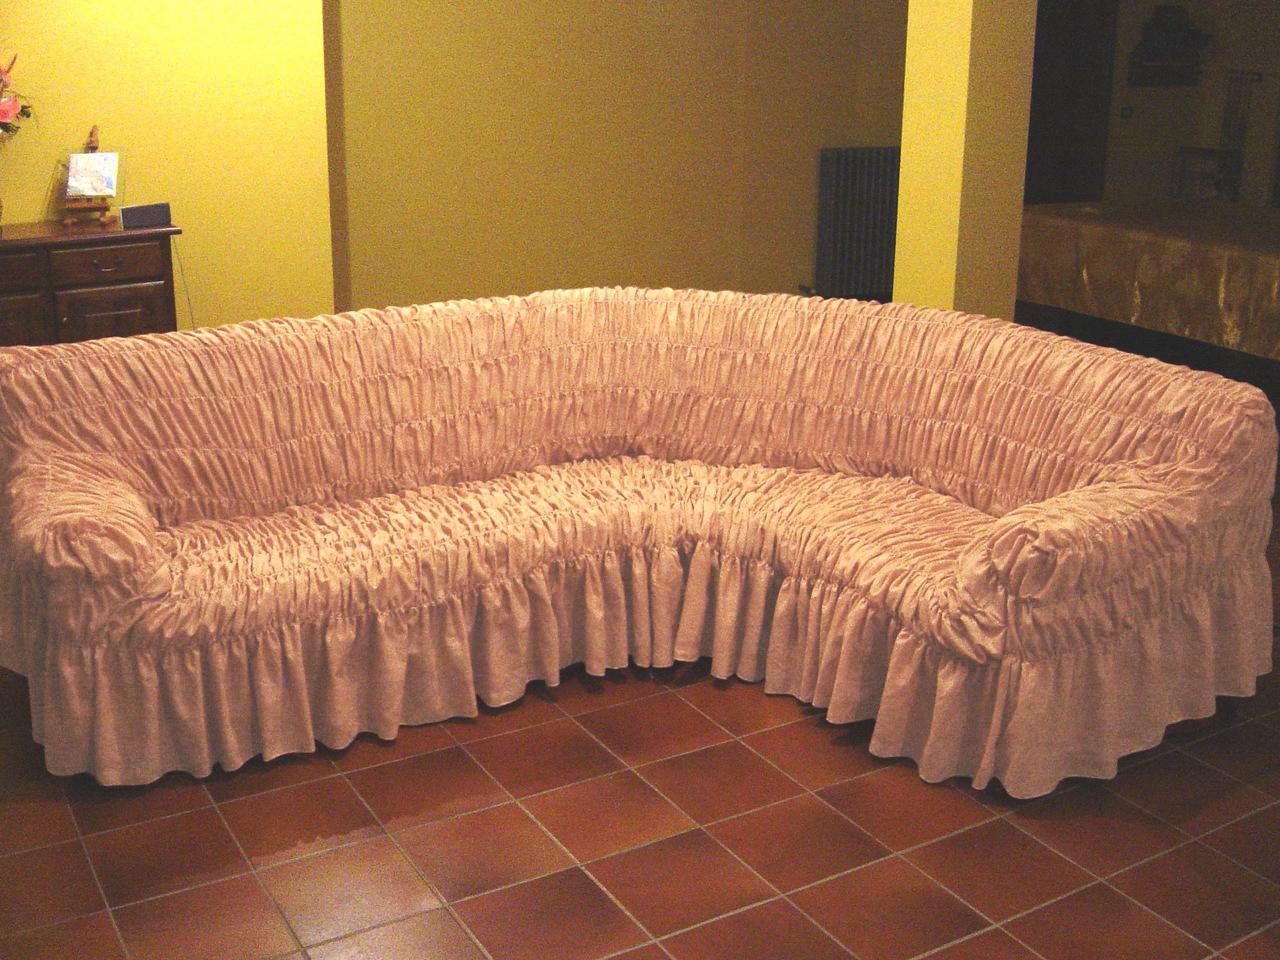 Еврочехол на диван своими руками фото